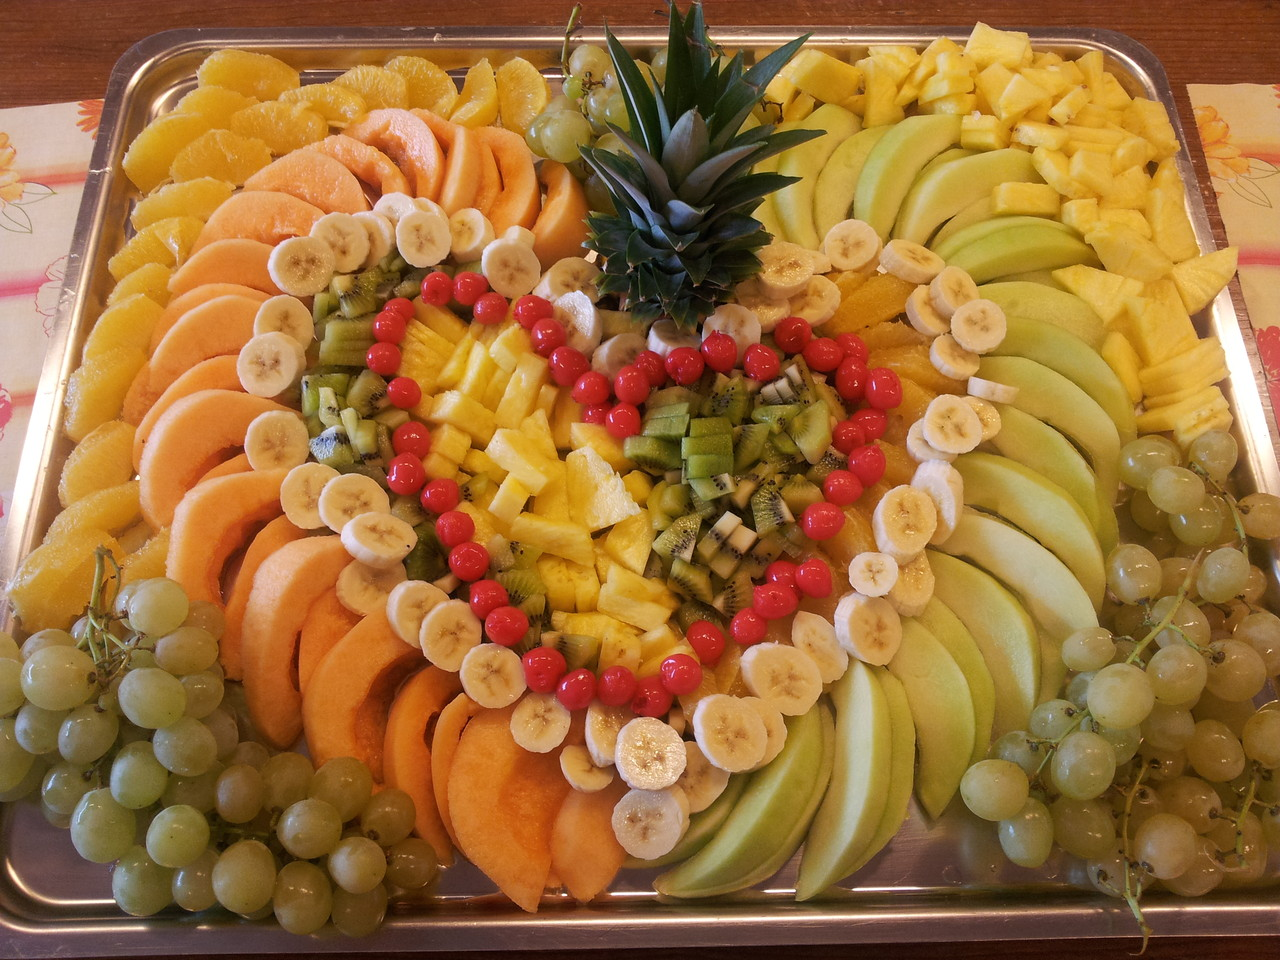 Fruchtplatte pro Person (100gr.) sFr. 1.90